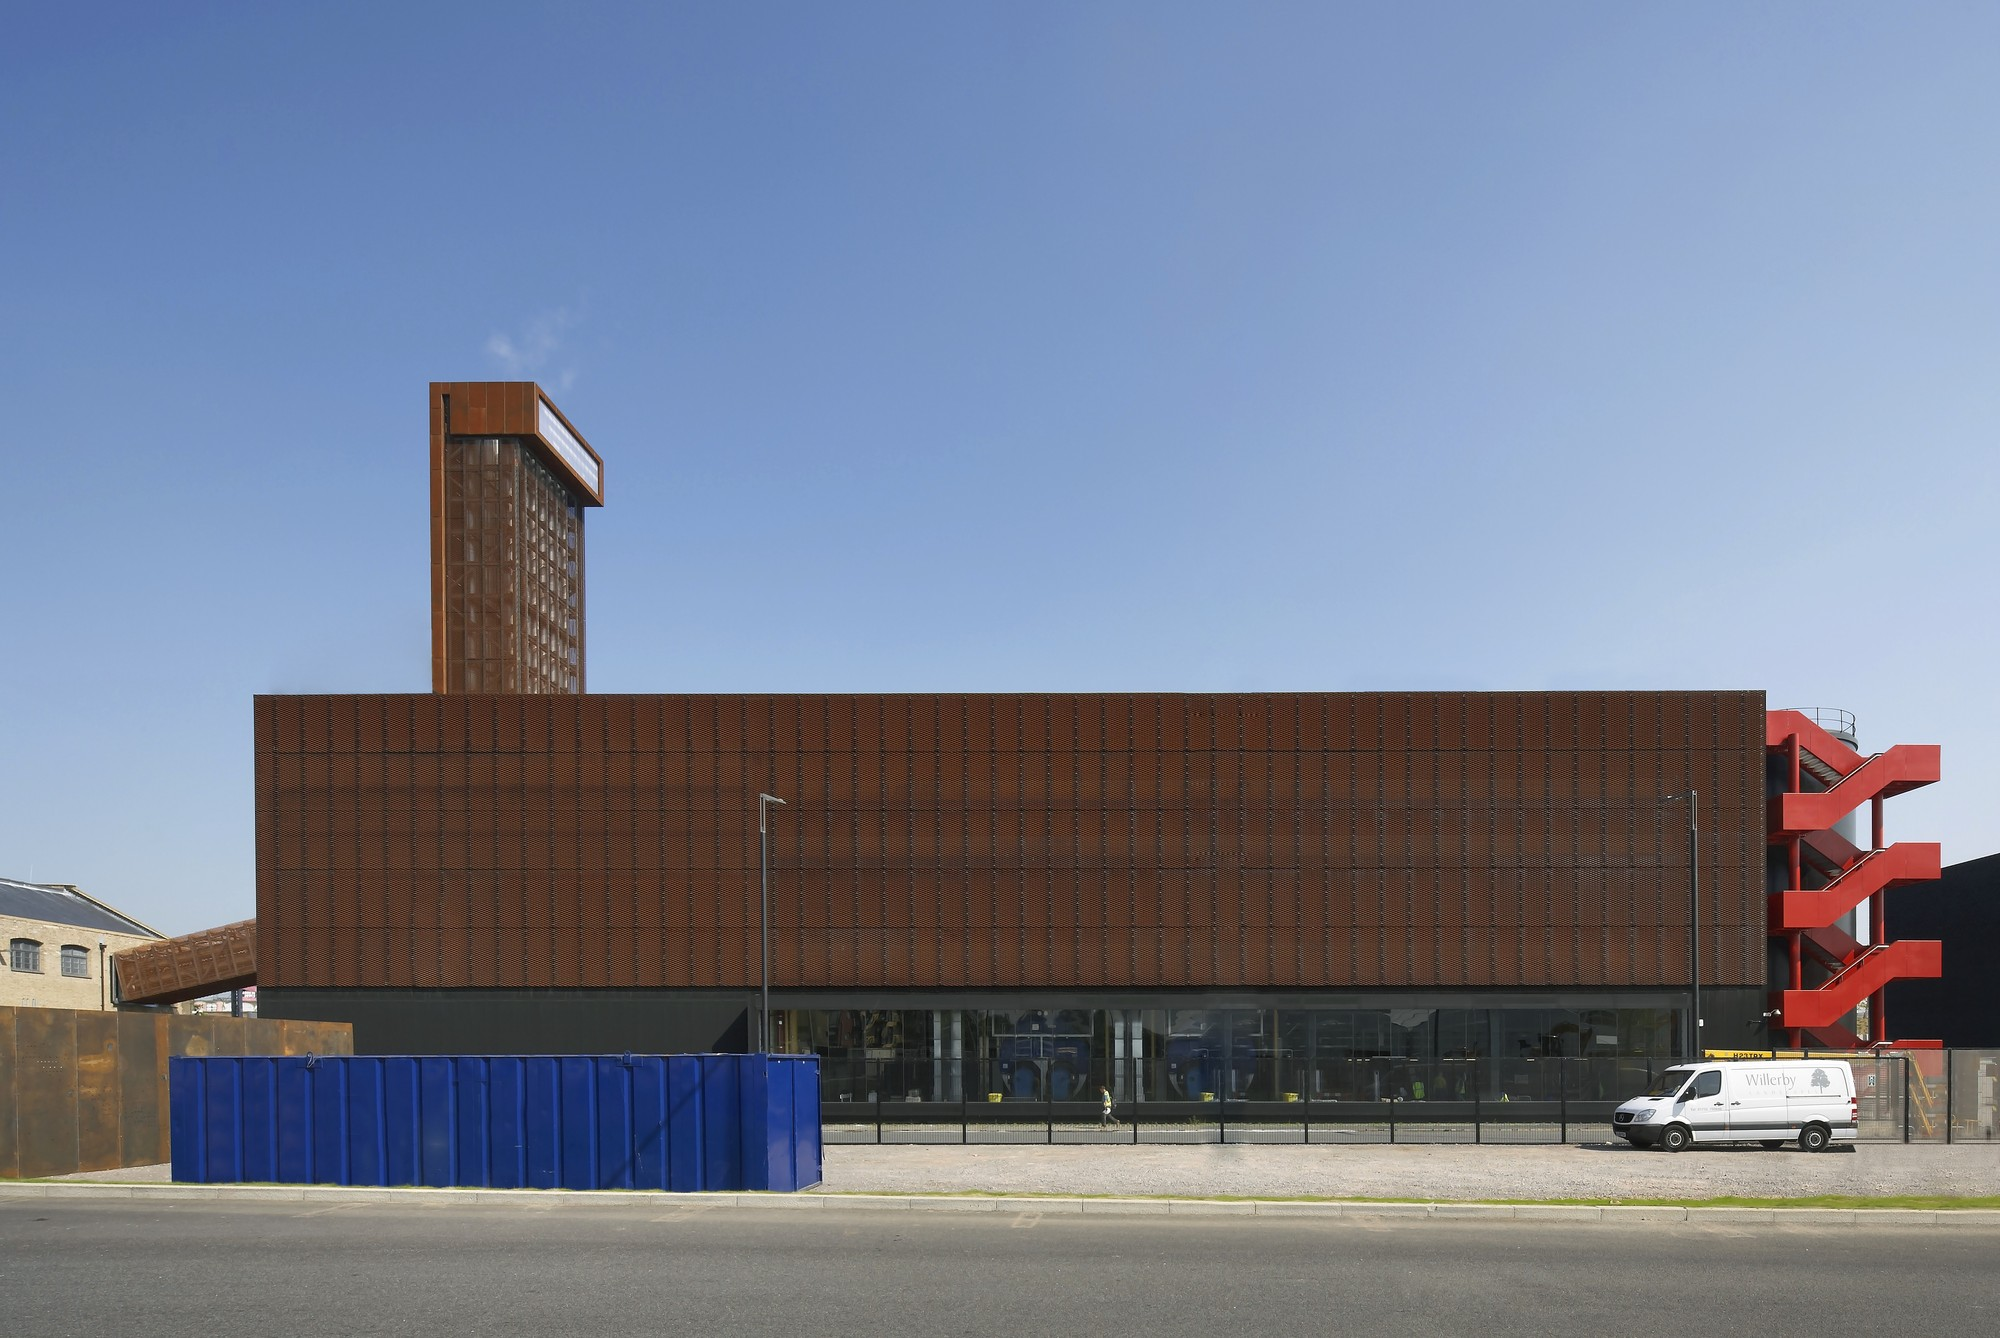 Olympic Energy Centres / John McAslan + Partners, © Hufton + Crow